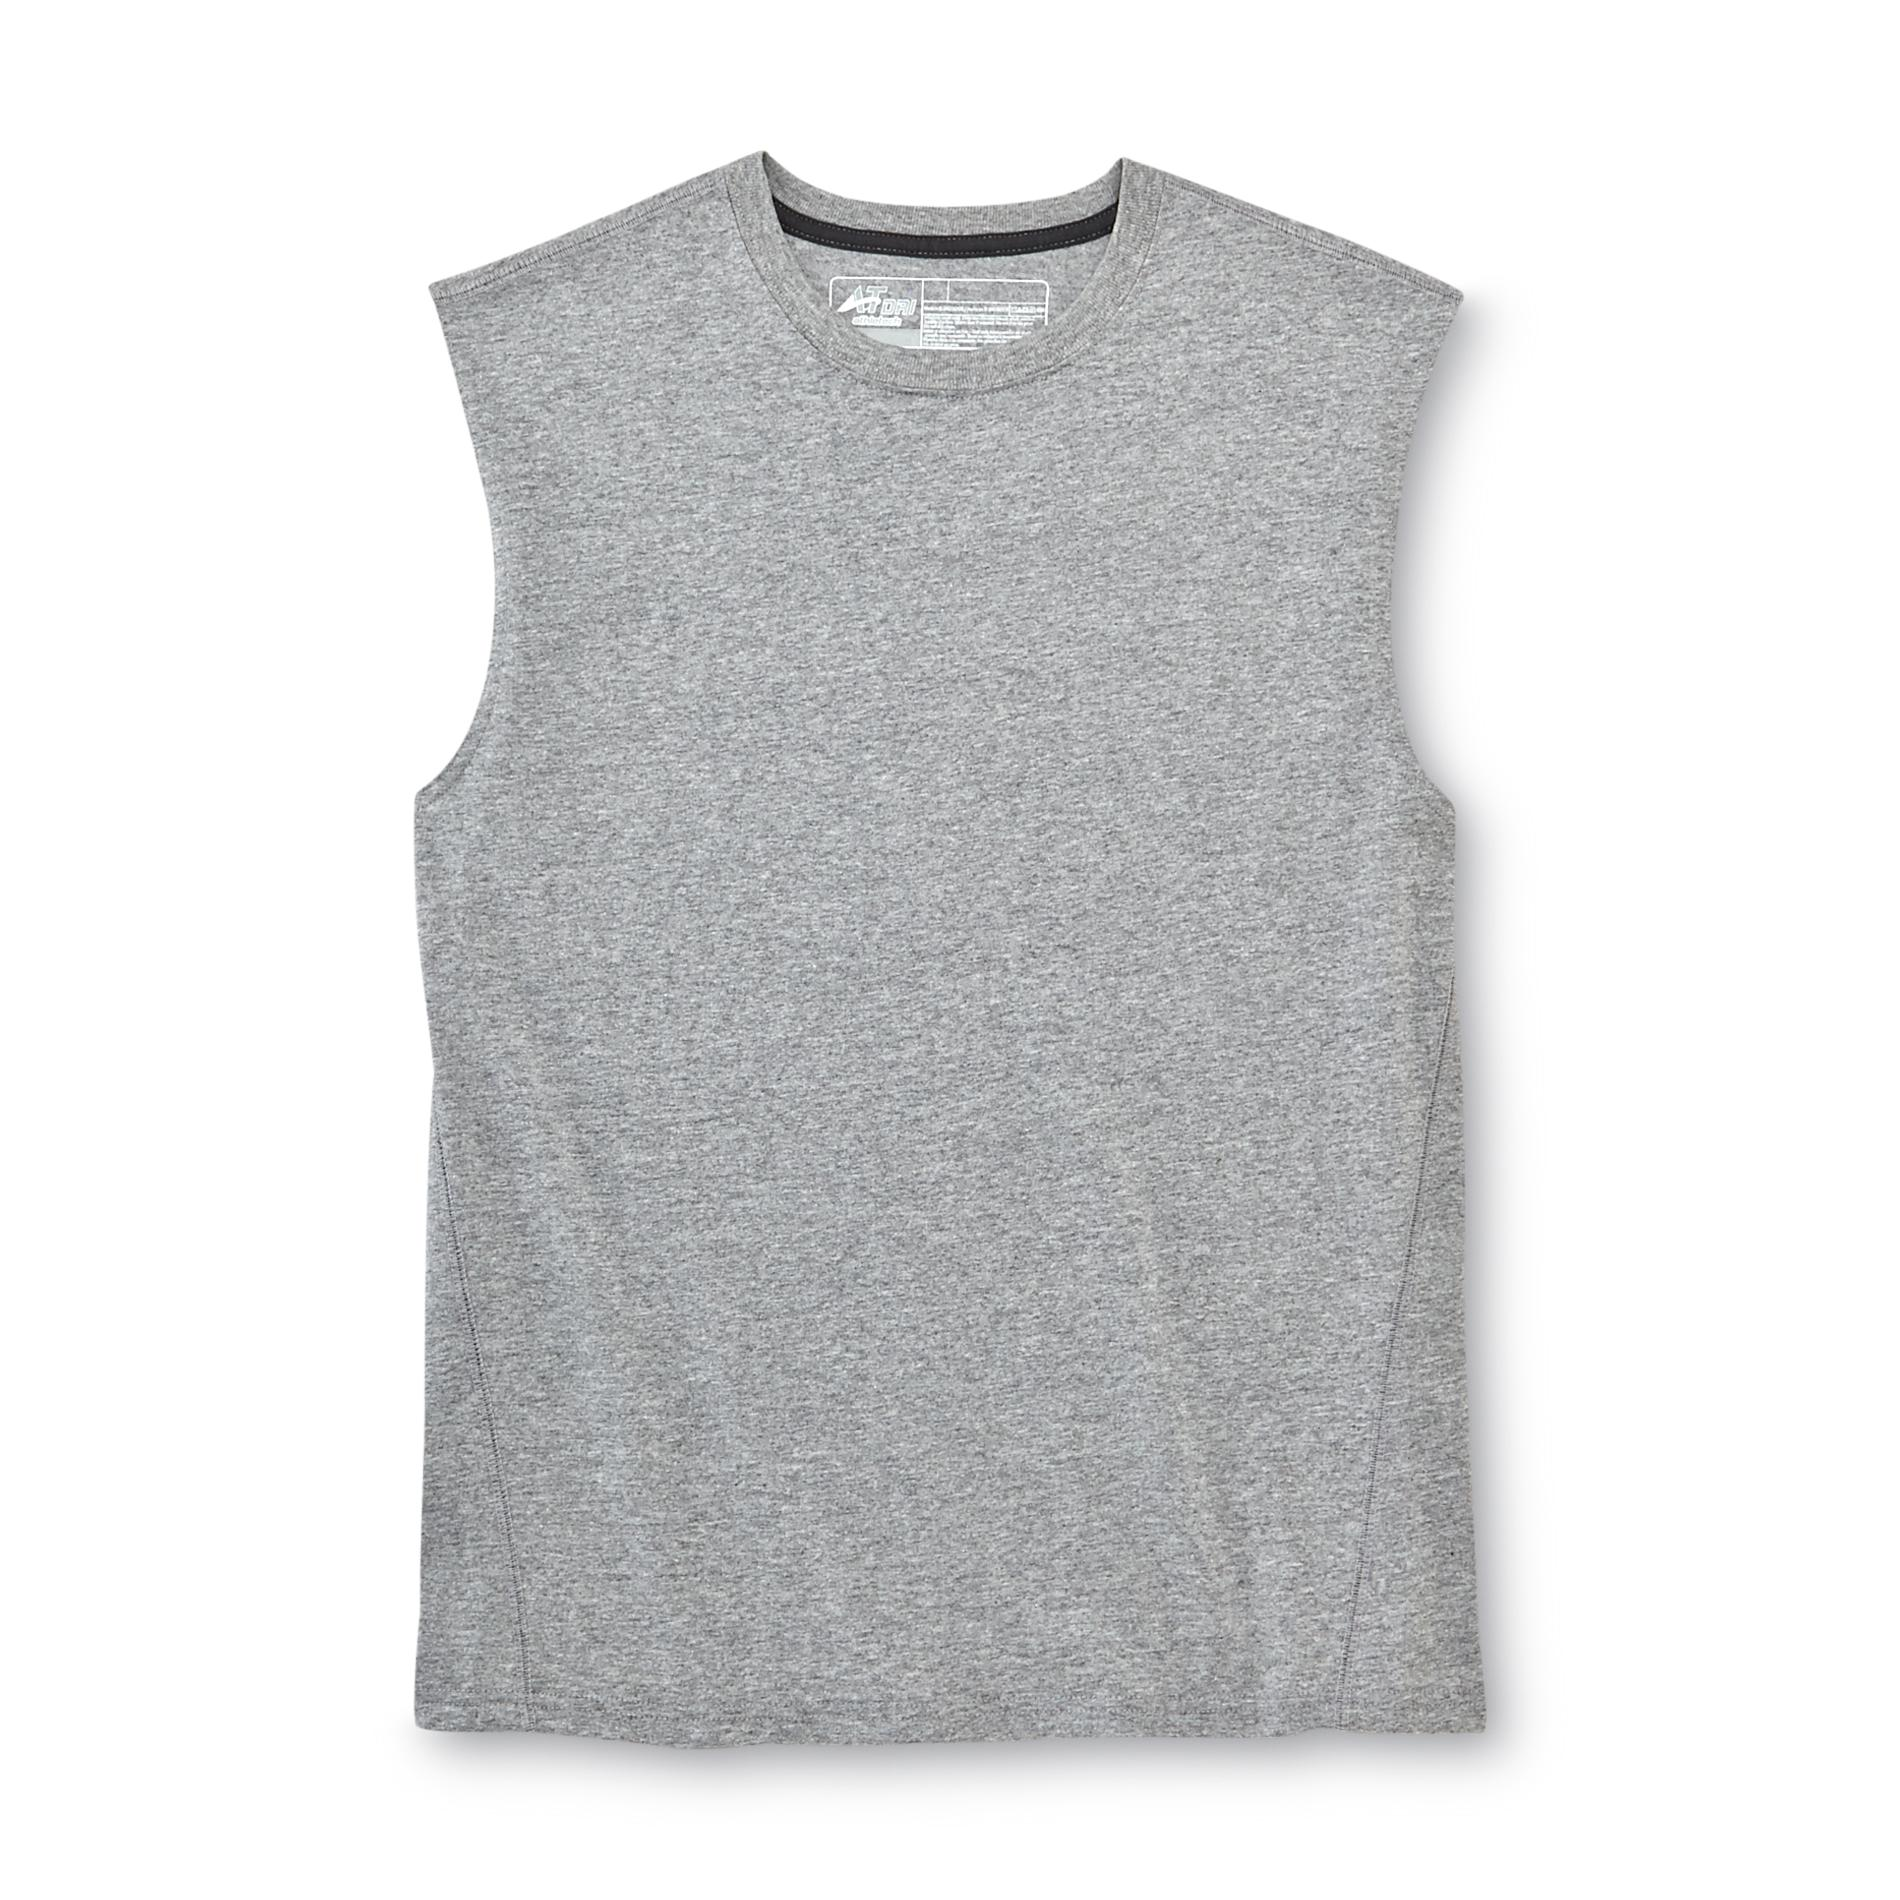 Athletech Men's Jersey Knit Muscle Shirt